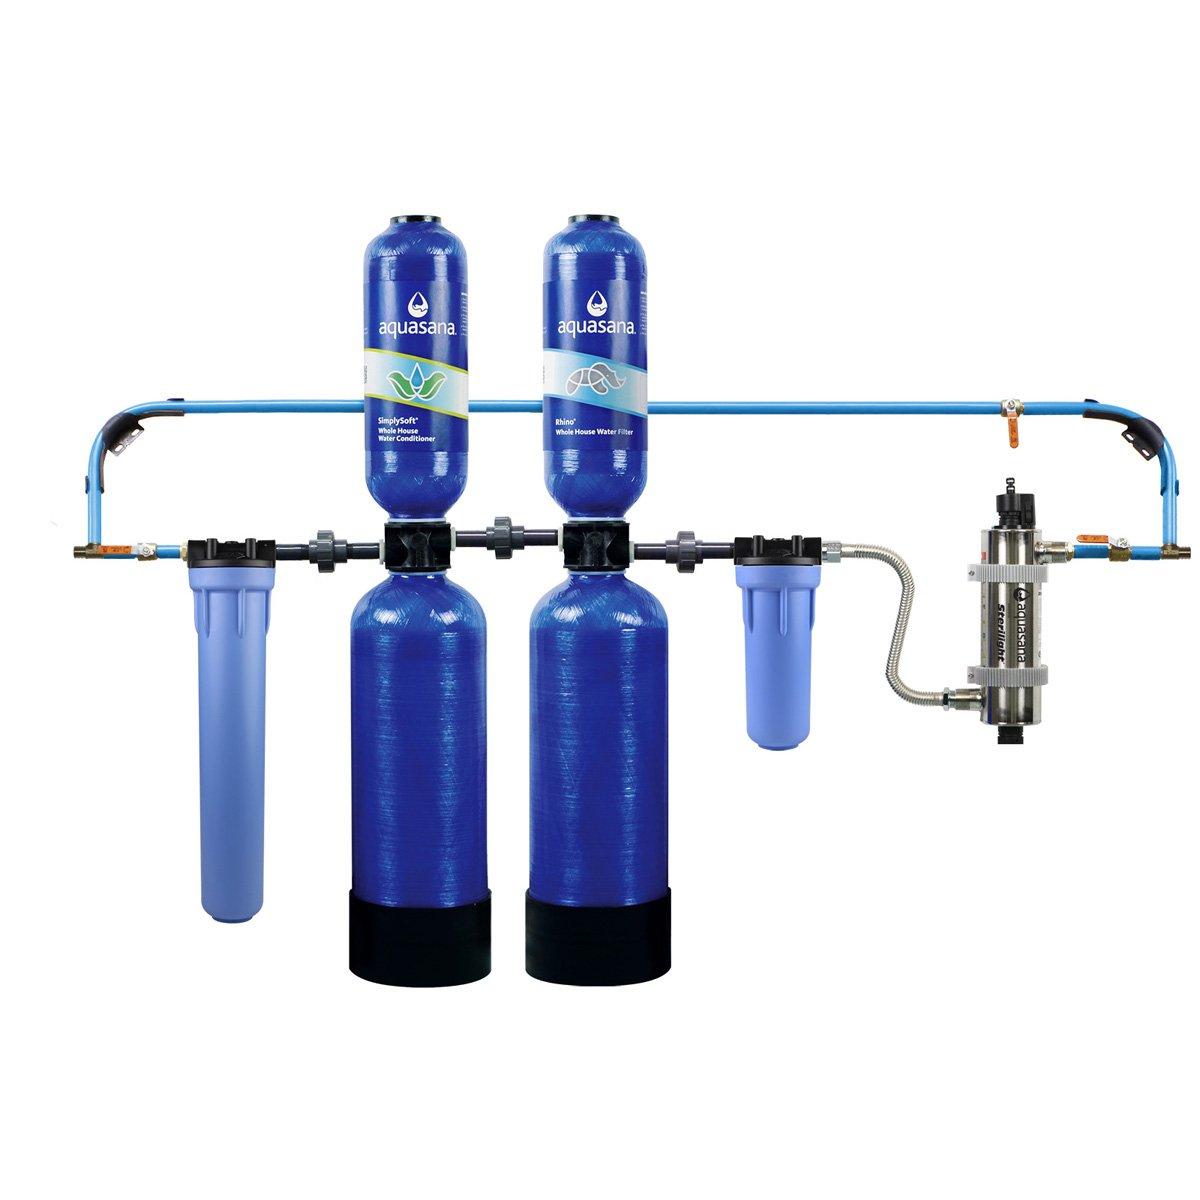 Aquasana 10-Year, 1,000,000 Gallon Whole House Water Filter with Salt-Free Softener, UV Filtration, and Professional Installation Kit (B00XAJK52Q) $1518.58